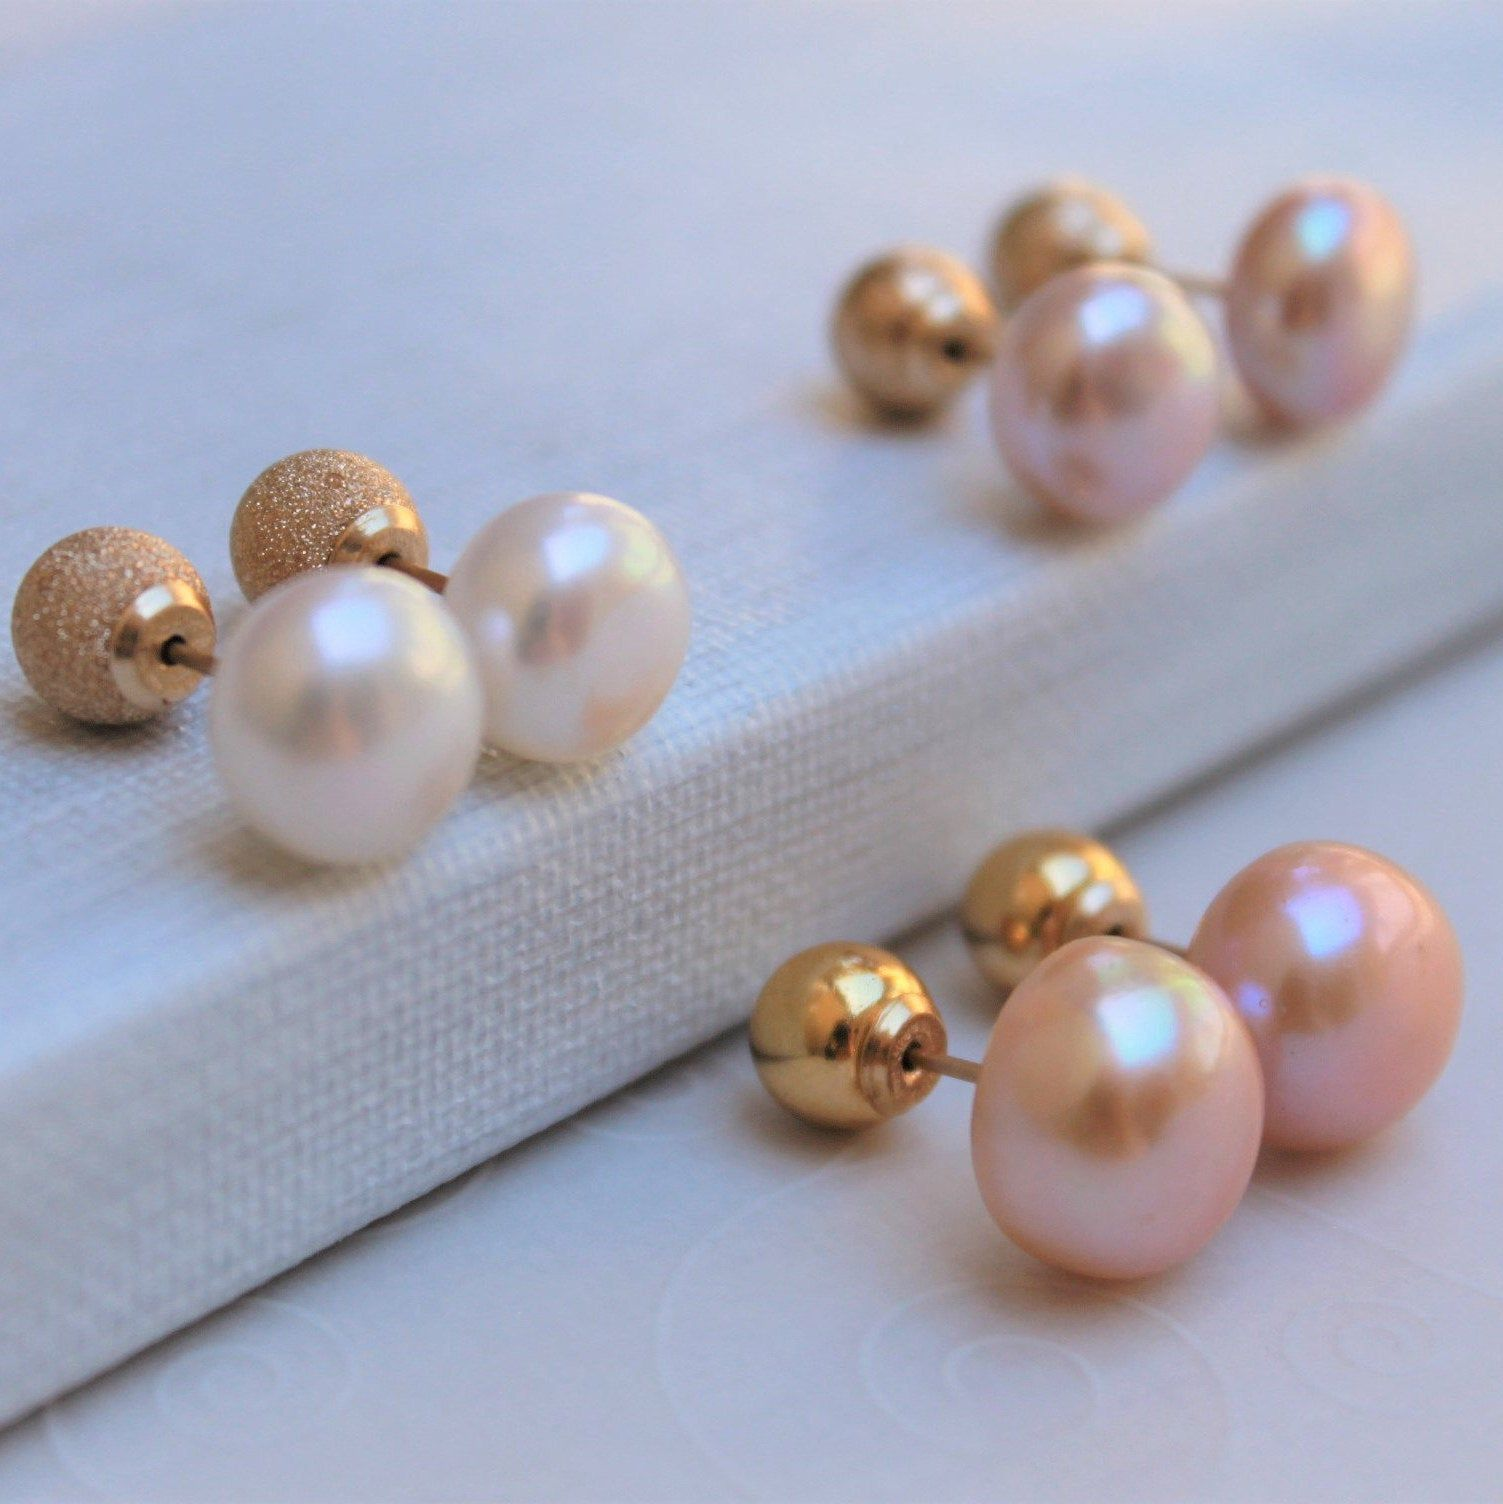 Pearl Stud Earrings Pearl and gold stud earrings Freshwater Pearl Post Earrings ball earrings,stud earrings post earrings